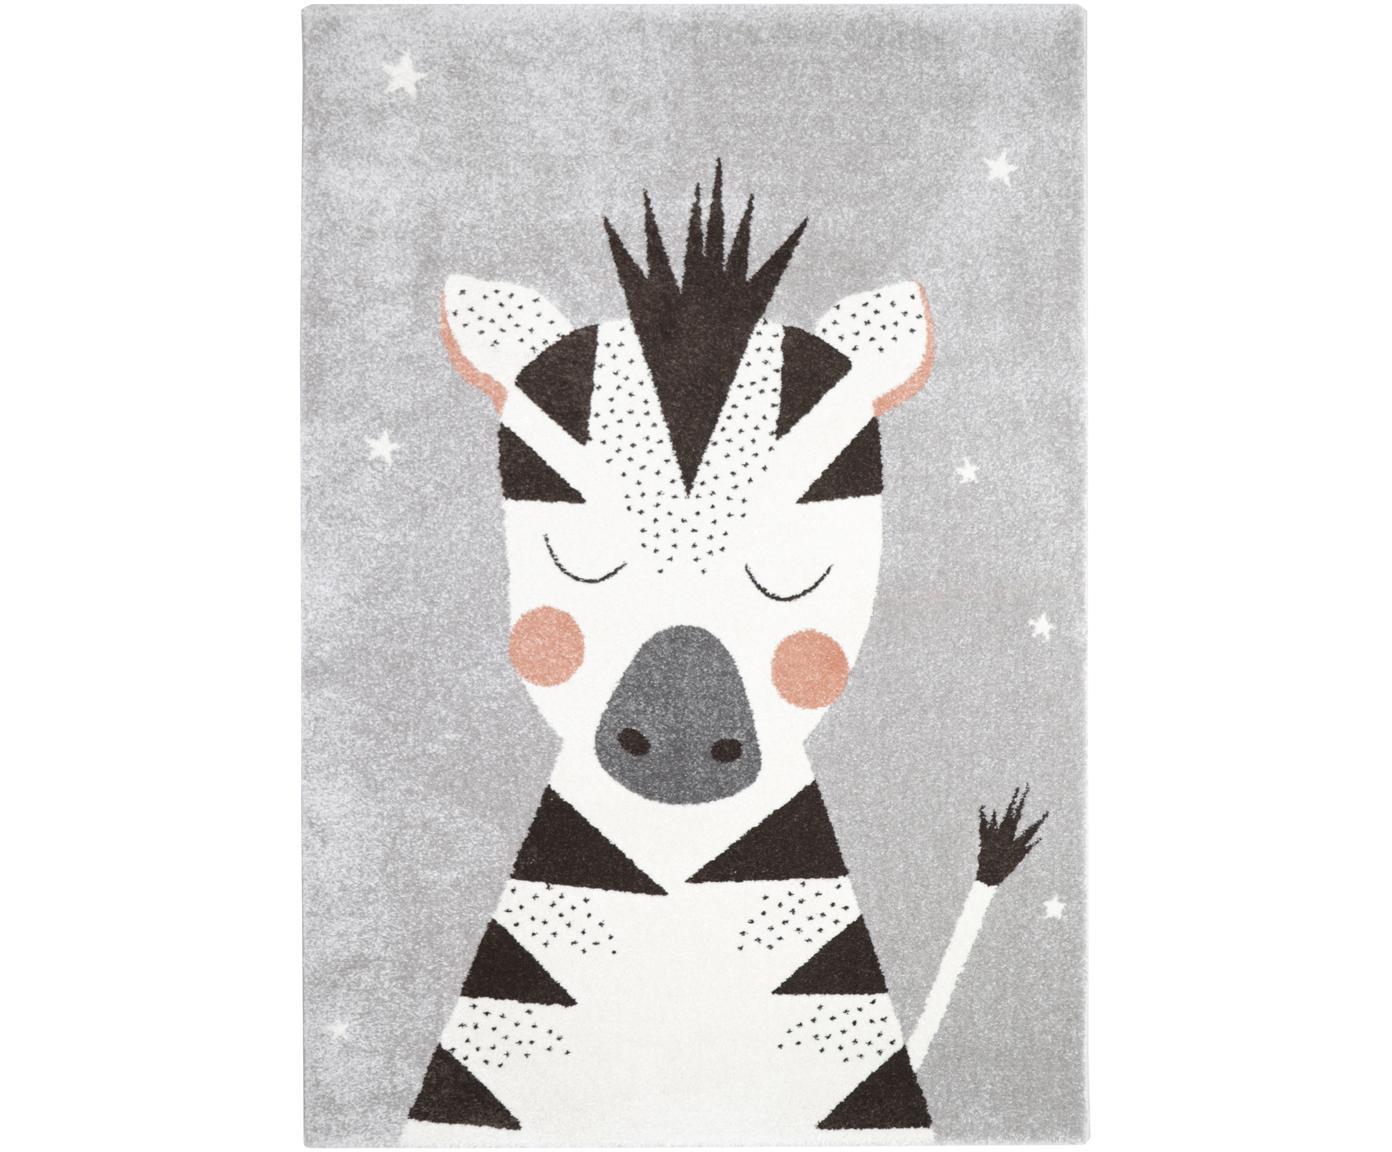 Teppich Kika, Polypropylen, Grau, Schwarz, Weiß, Rosa, 120 x 170 cm